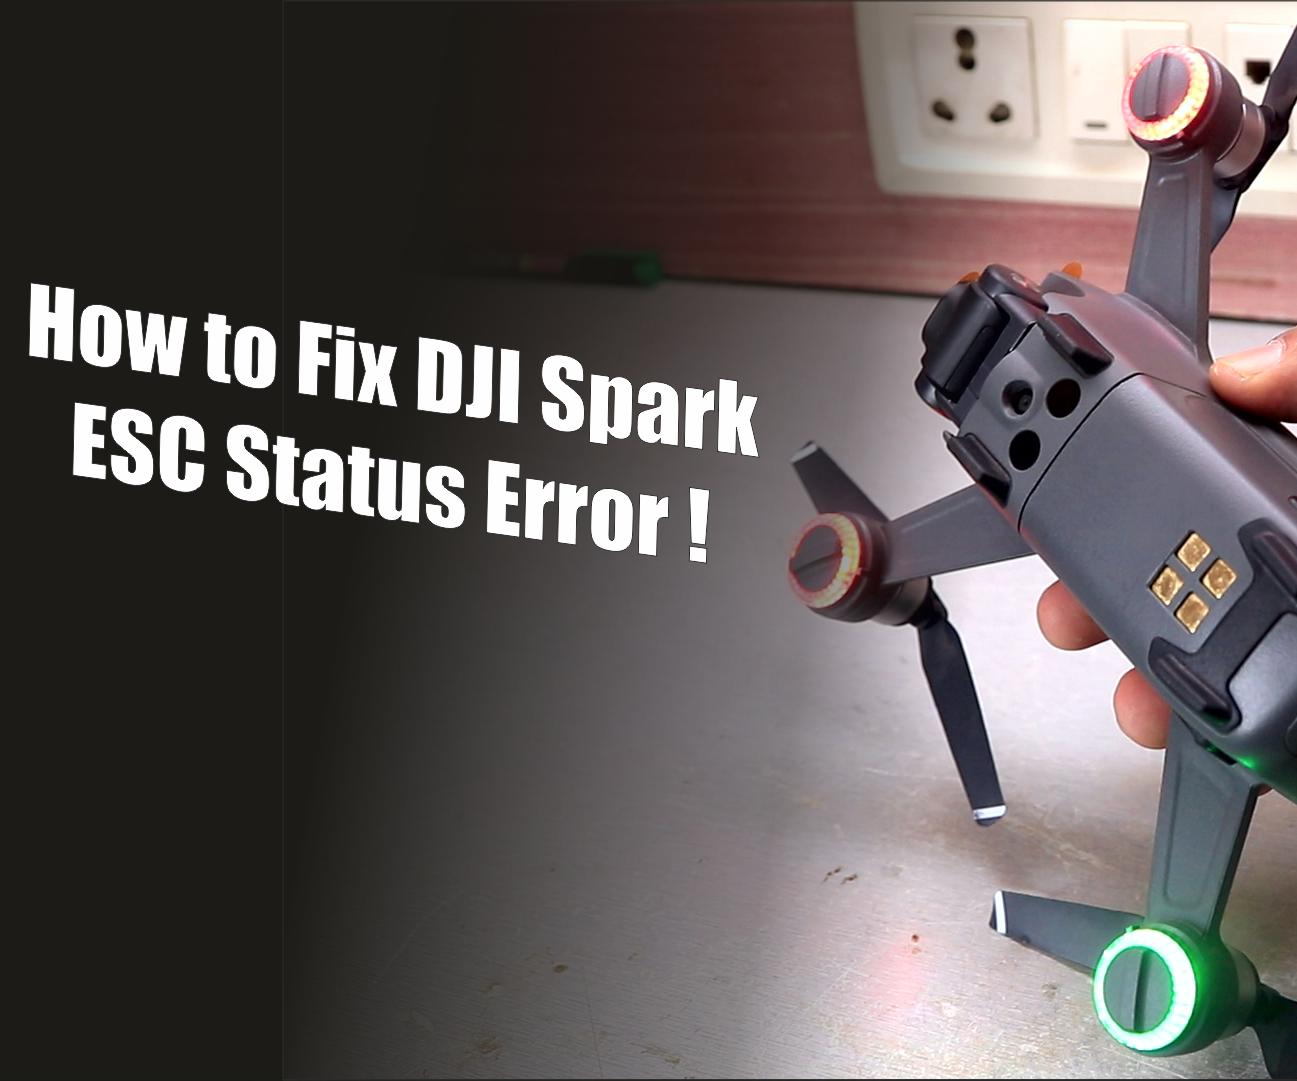 How to Fix DJI Spark ESC Status Error!   Replacement